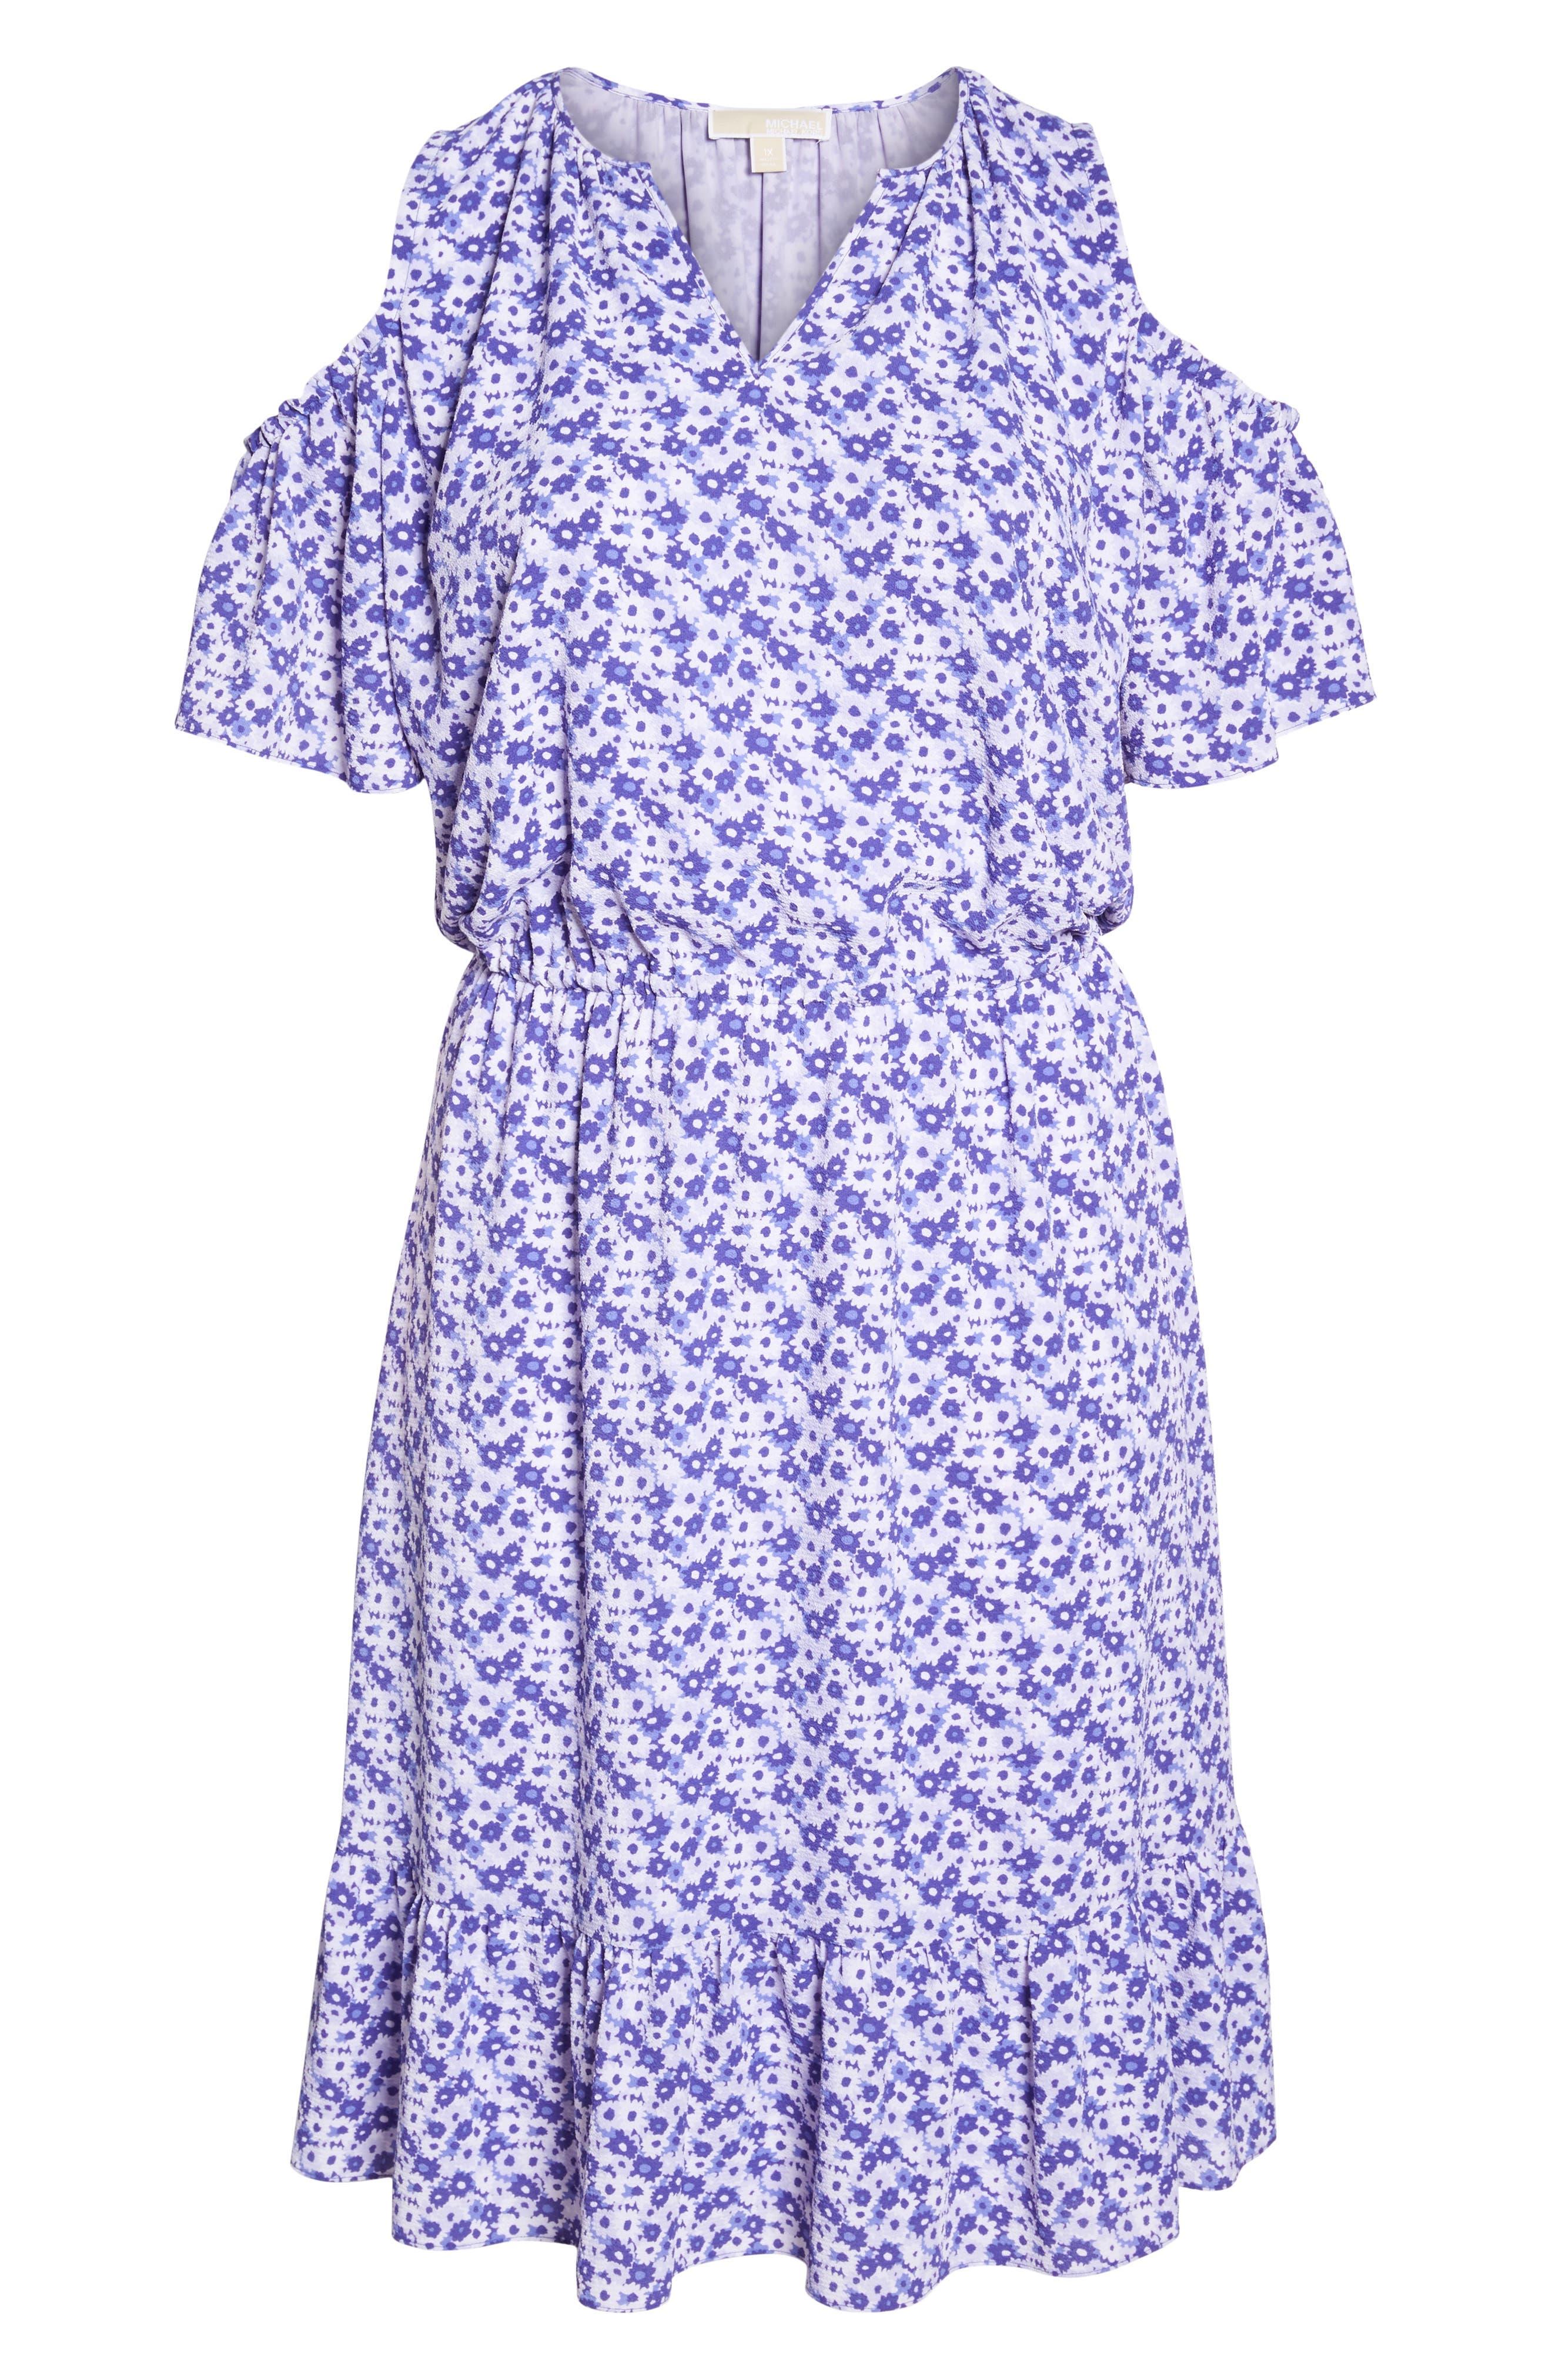 Floral Cold Shoulder Midi Dress,                             Alternate thumbnail 6, color,                             580